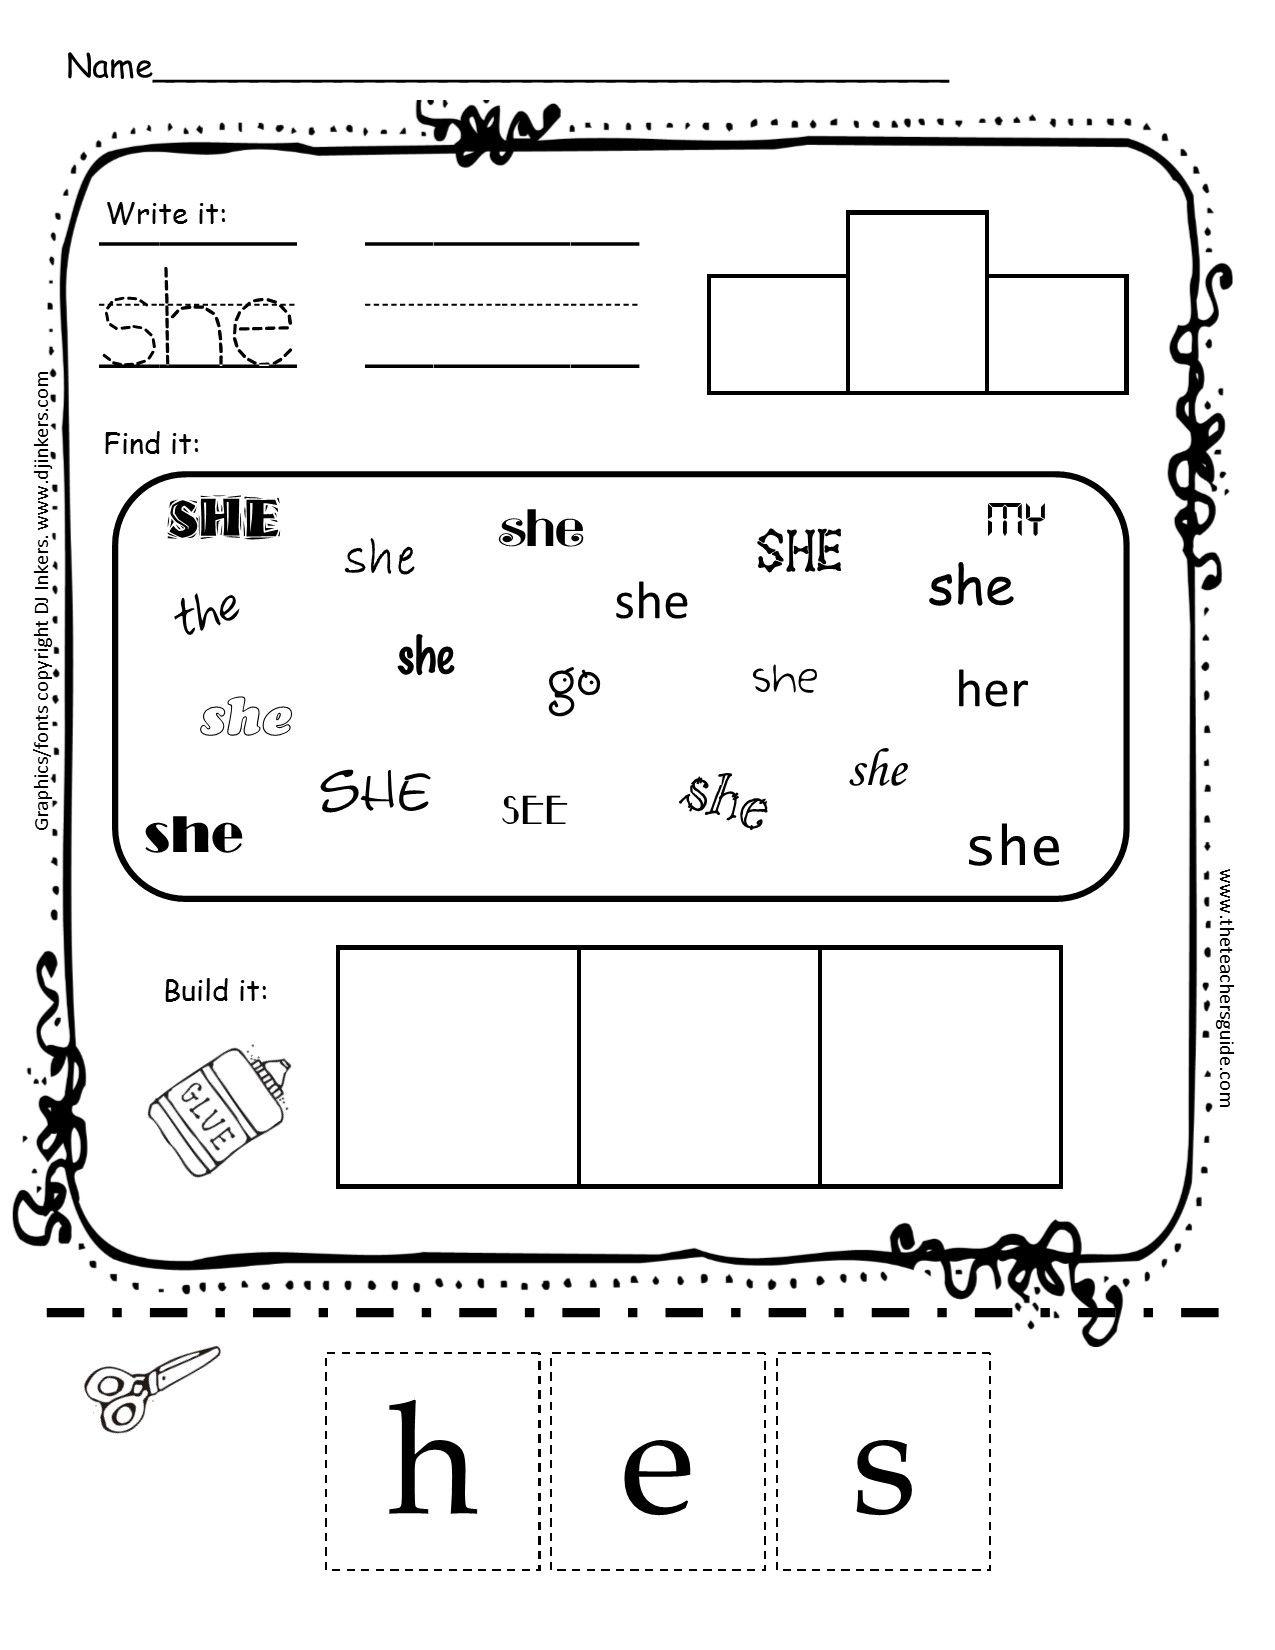 Kindergarten Sight Word Printouts From The Teachers Guide